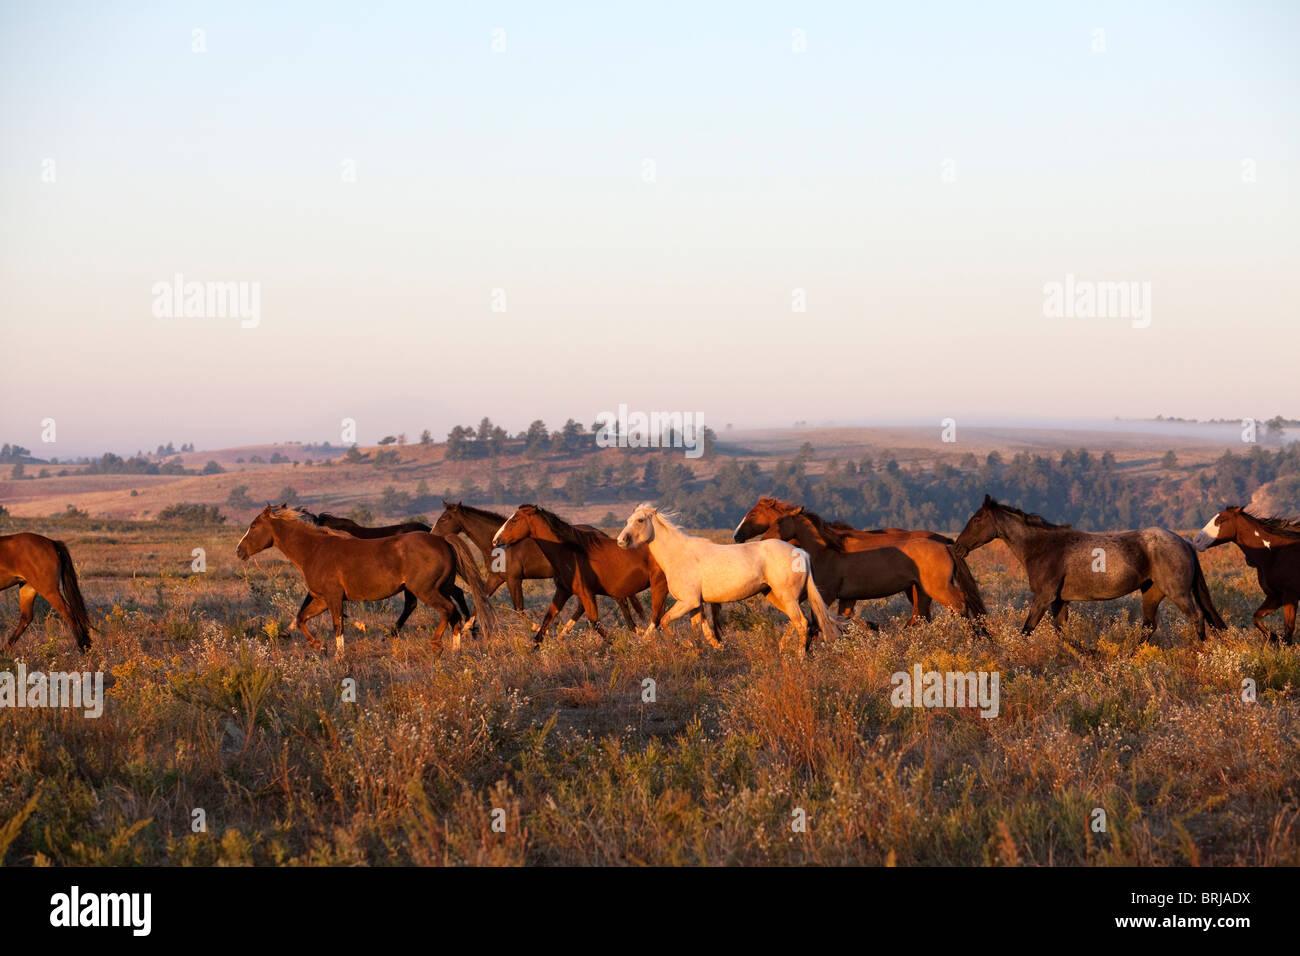 Black Hills Wild Horse Sanctuary, South Dakota, SD, (near Hot Springs) United States of America, USA - Stock Image